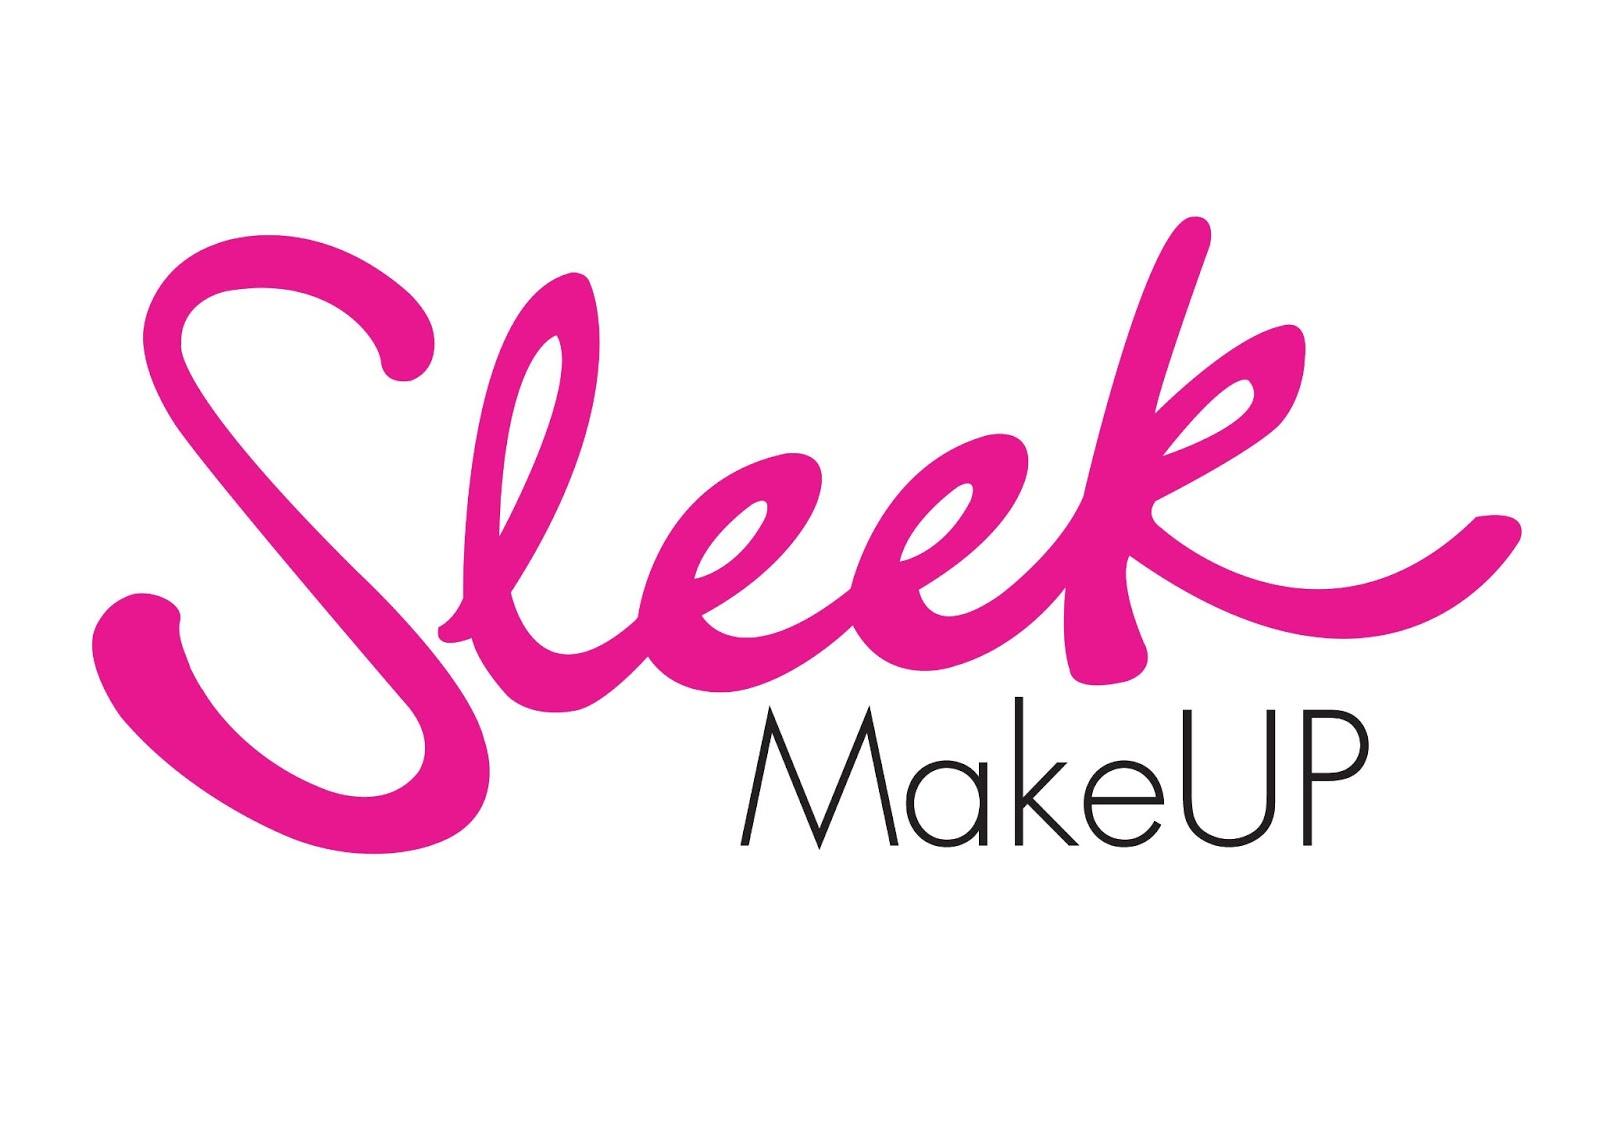 Cruelty Information Sleek Makeup Tested Animals